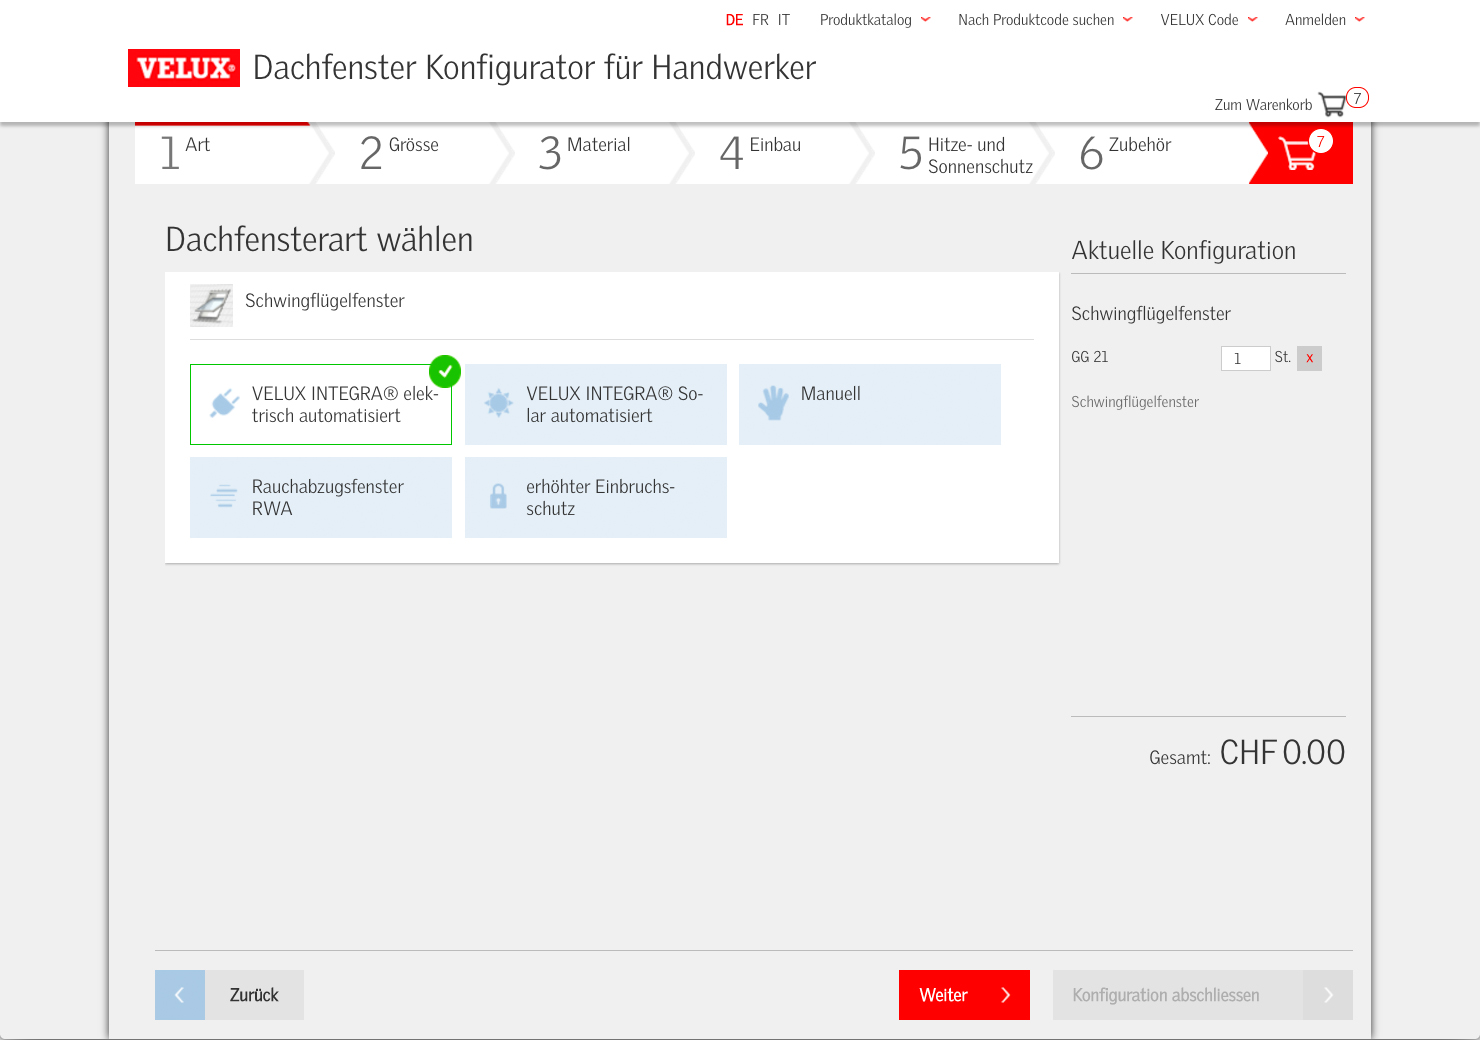 Online Konfigurator Dachfenster slide 2